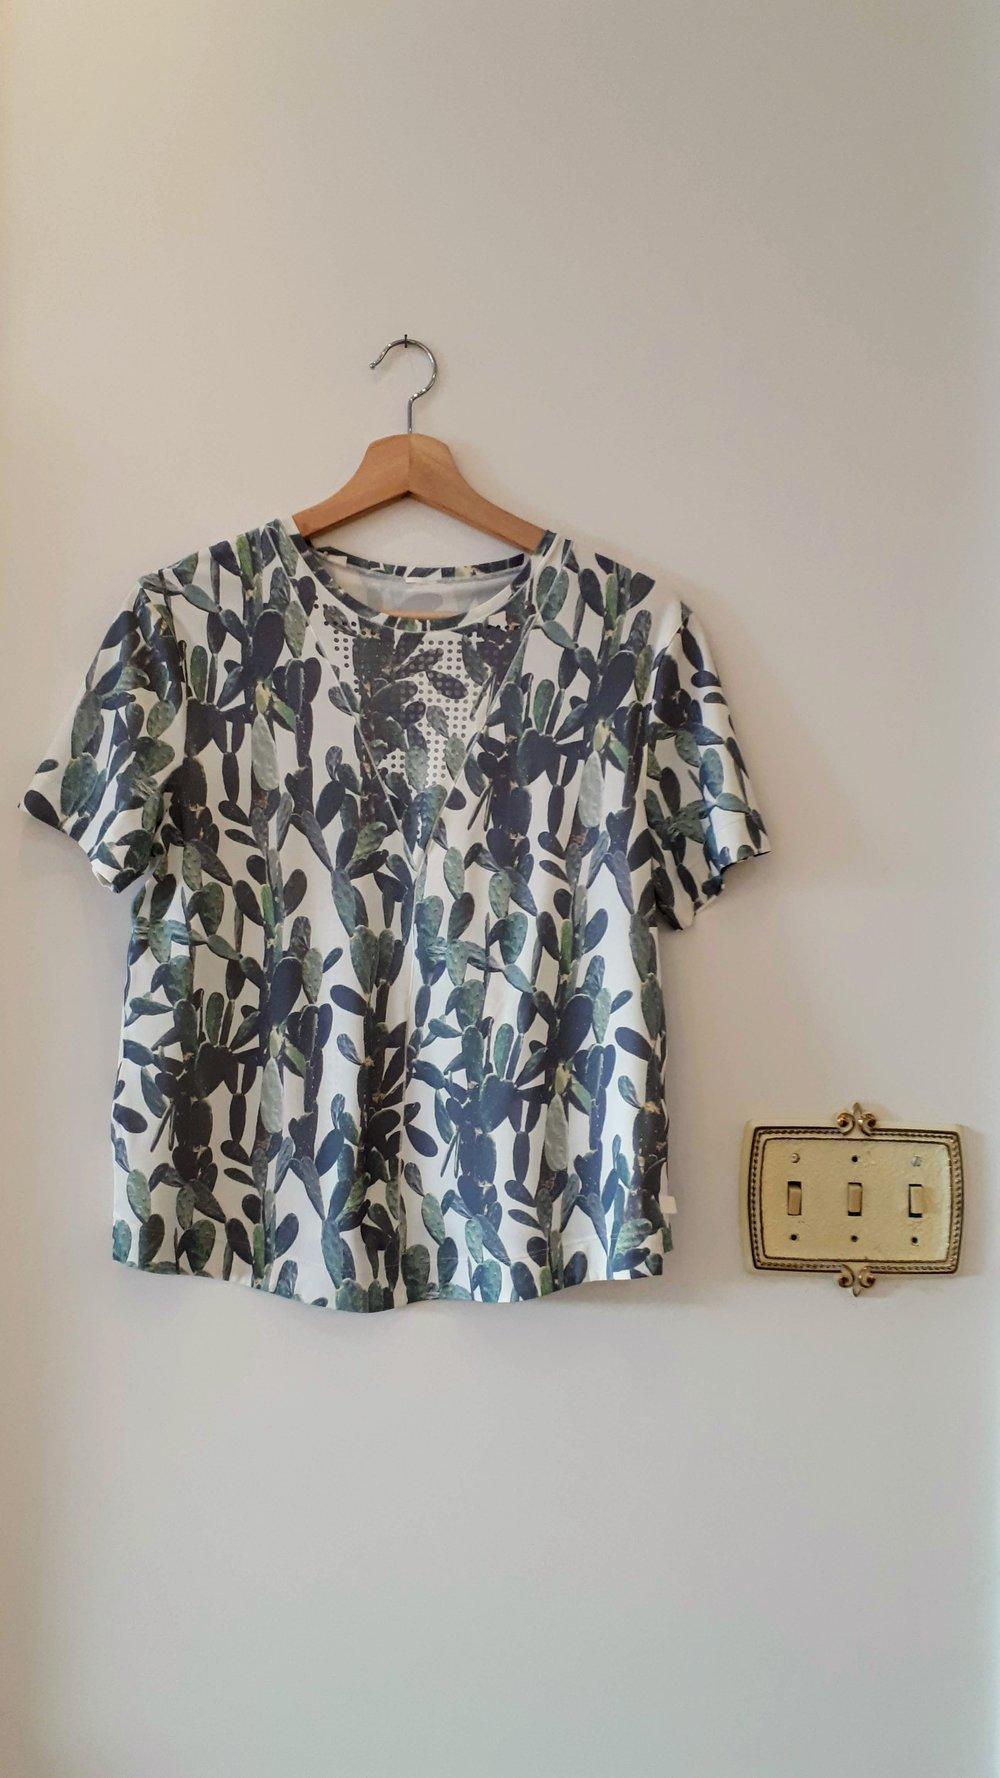 Lululemon top; Size M, $28